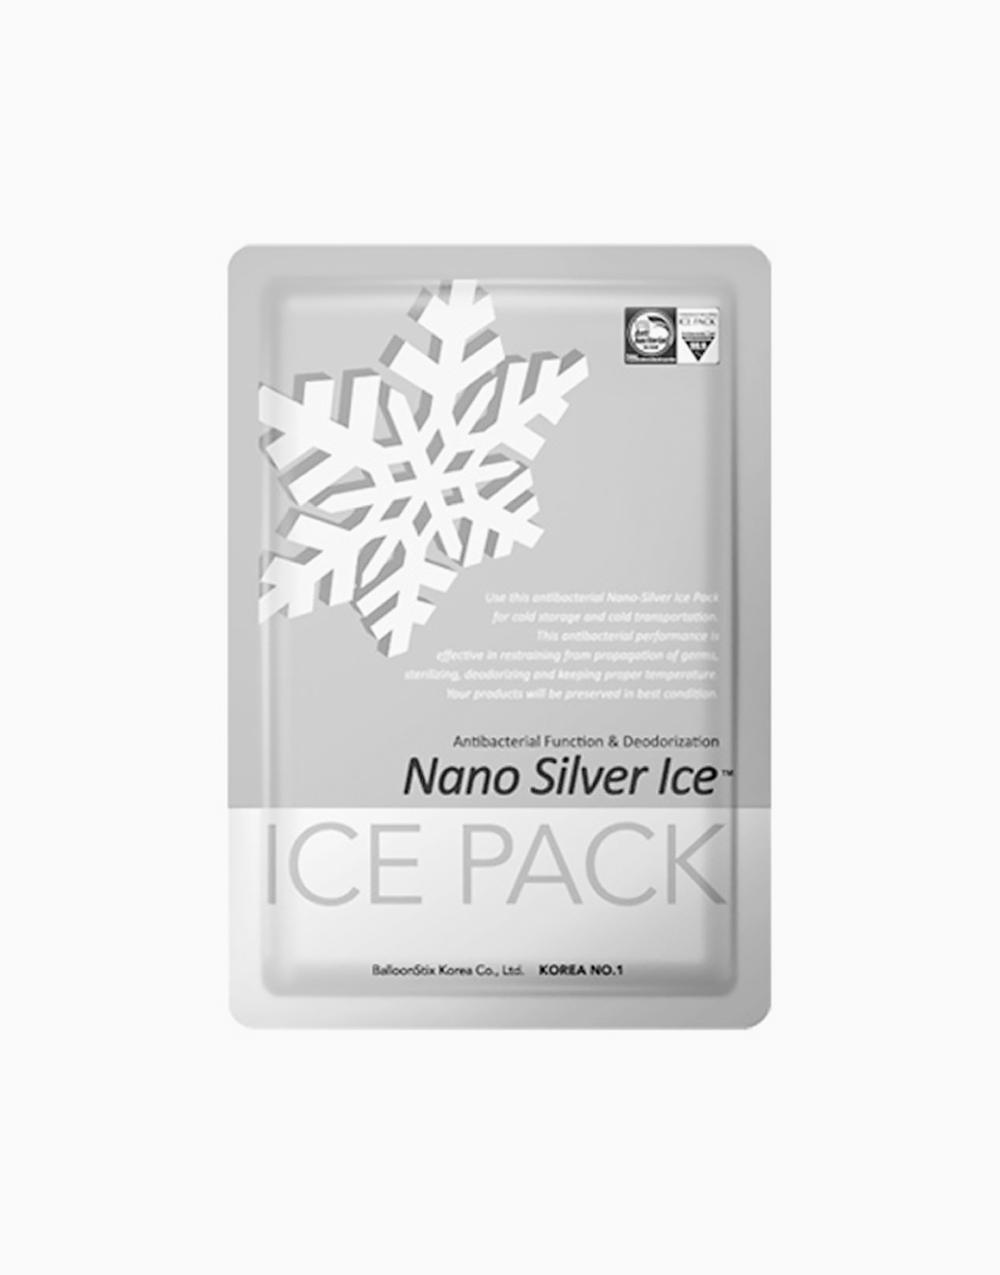 Nano Silver Ice Pack by Horigen